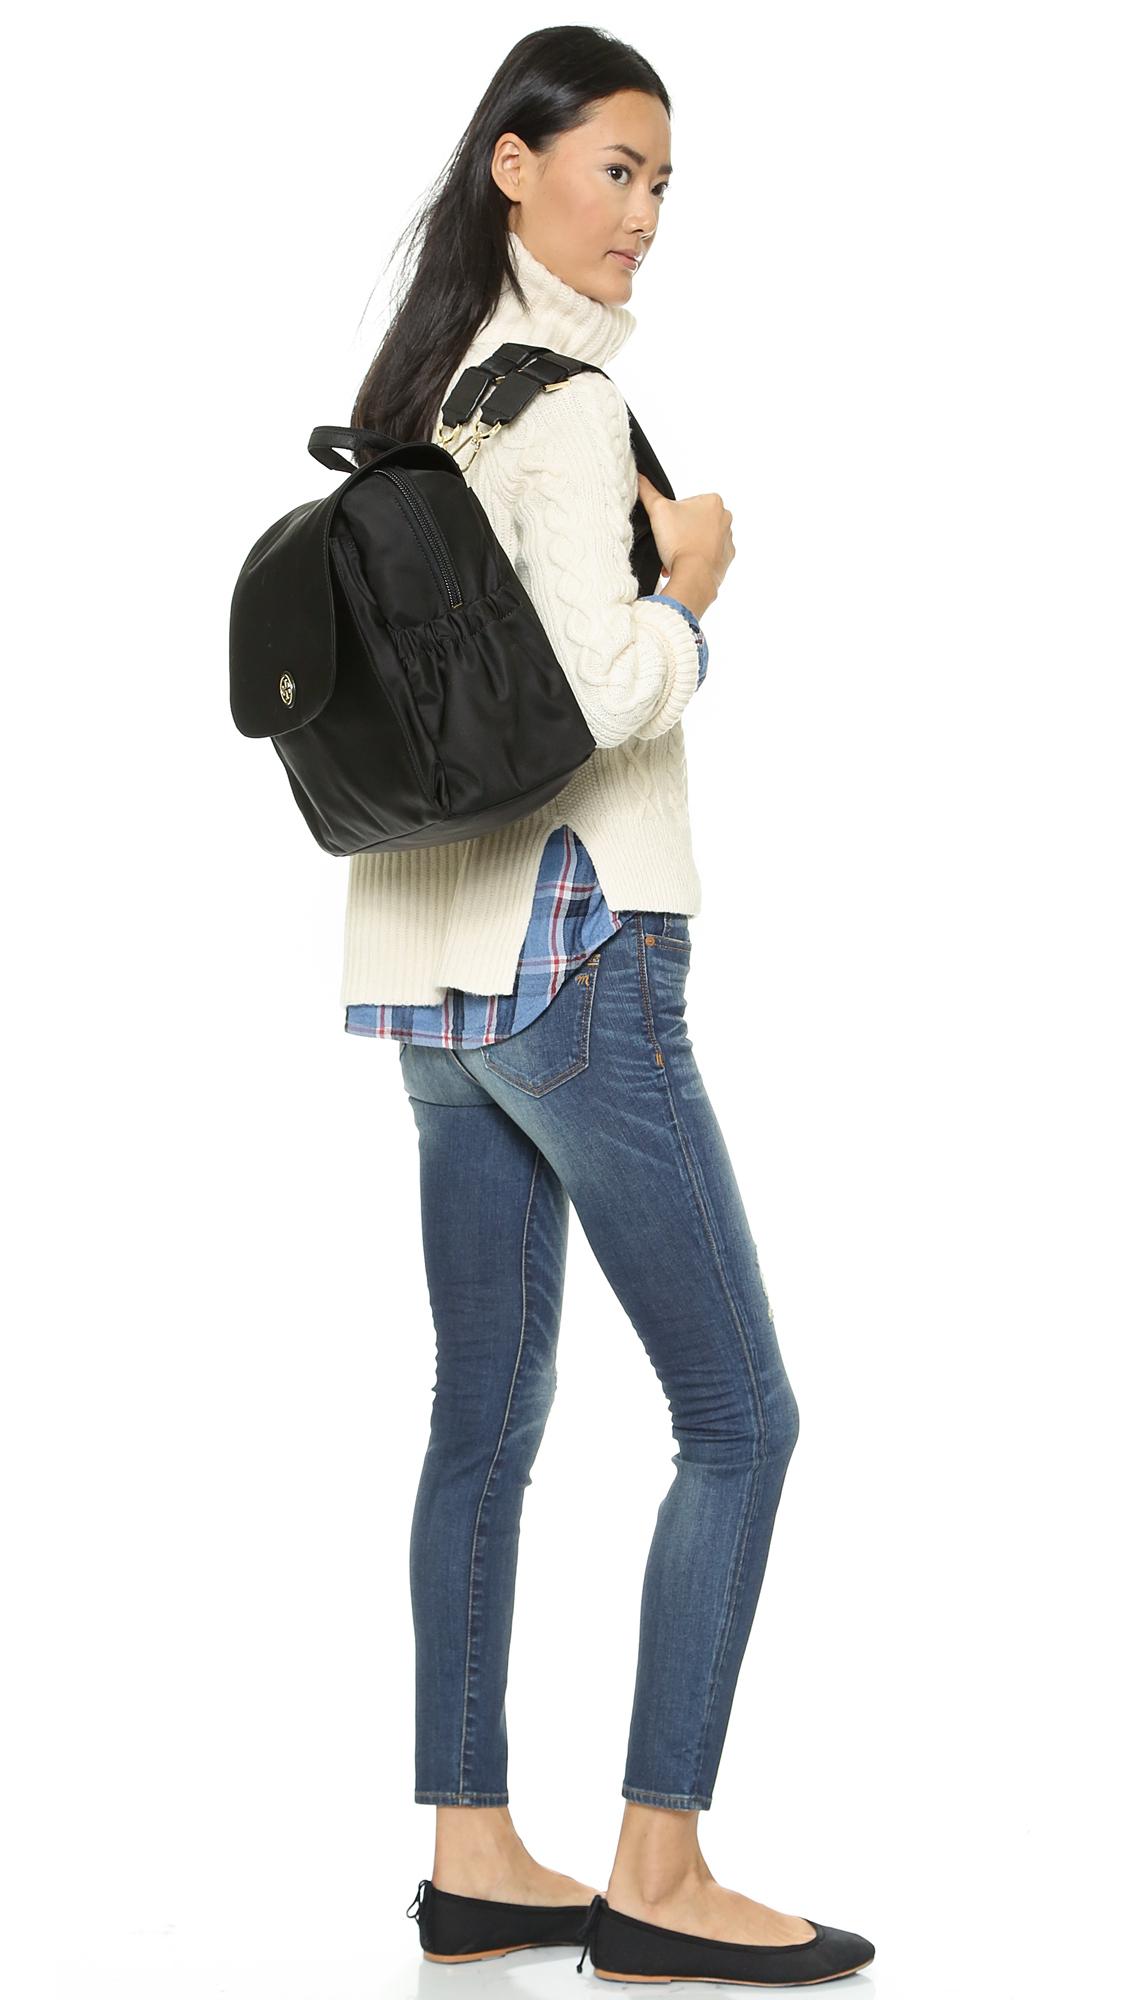 Tory burch Travel Nylon Baby Backpack Black in Black